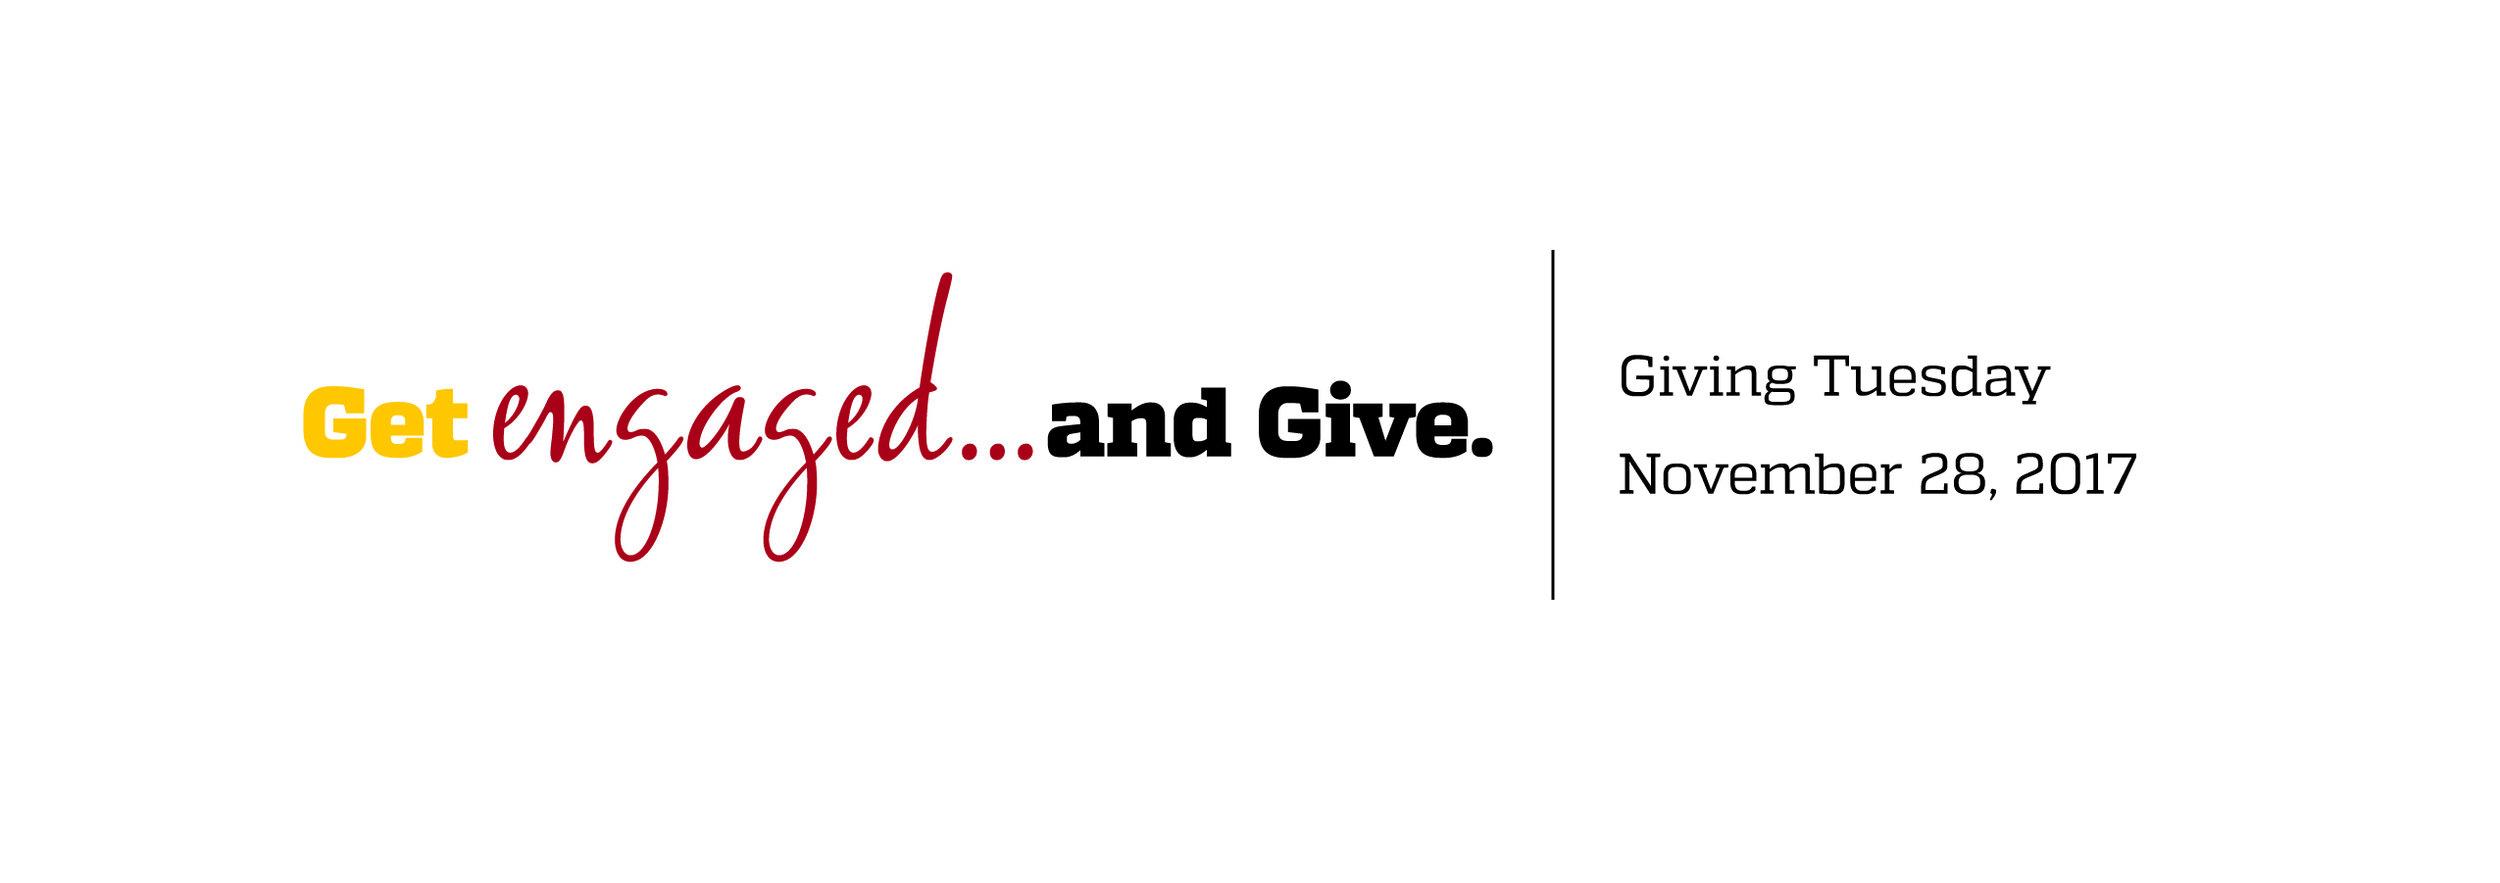 CHF Giving Tuesday Nov 28 2017 .jpg